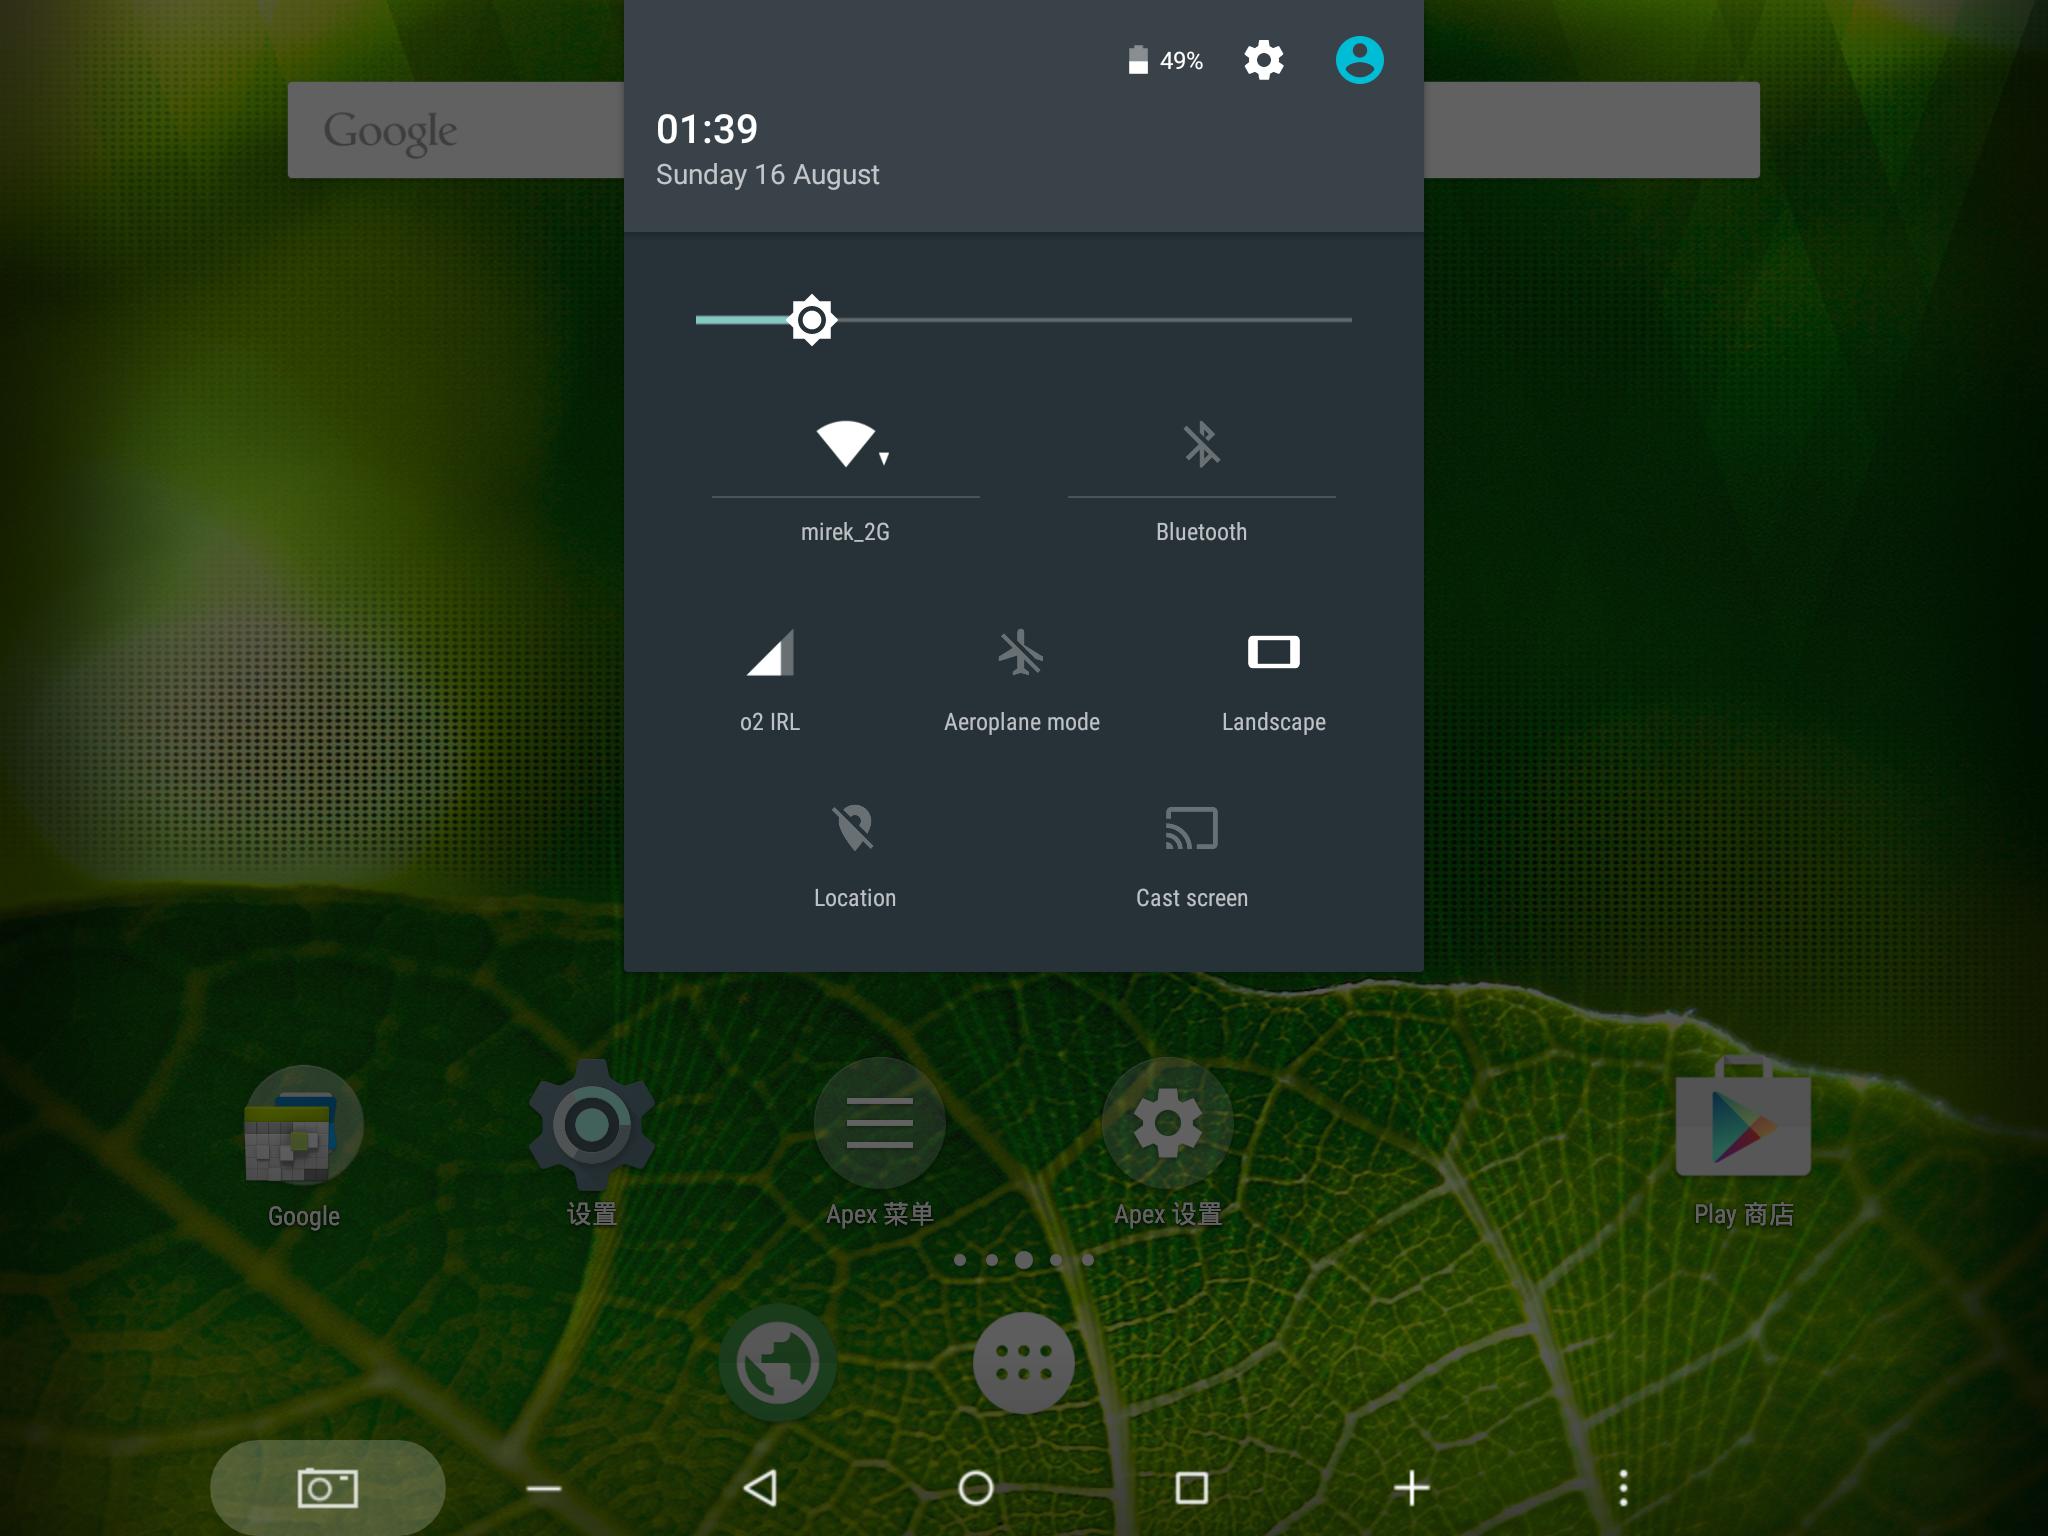 screenshot_2015-08-16-01-39-35